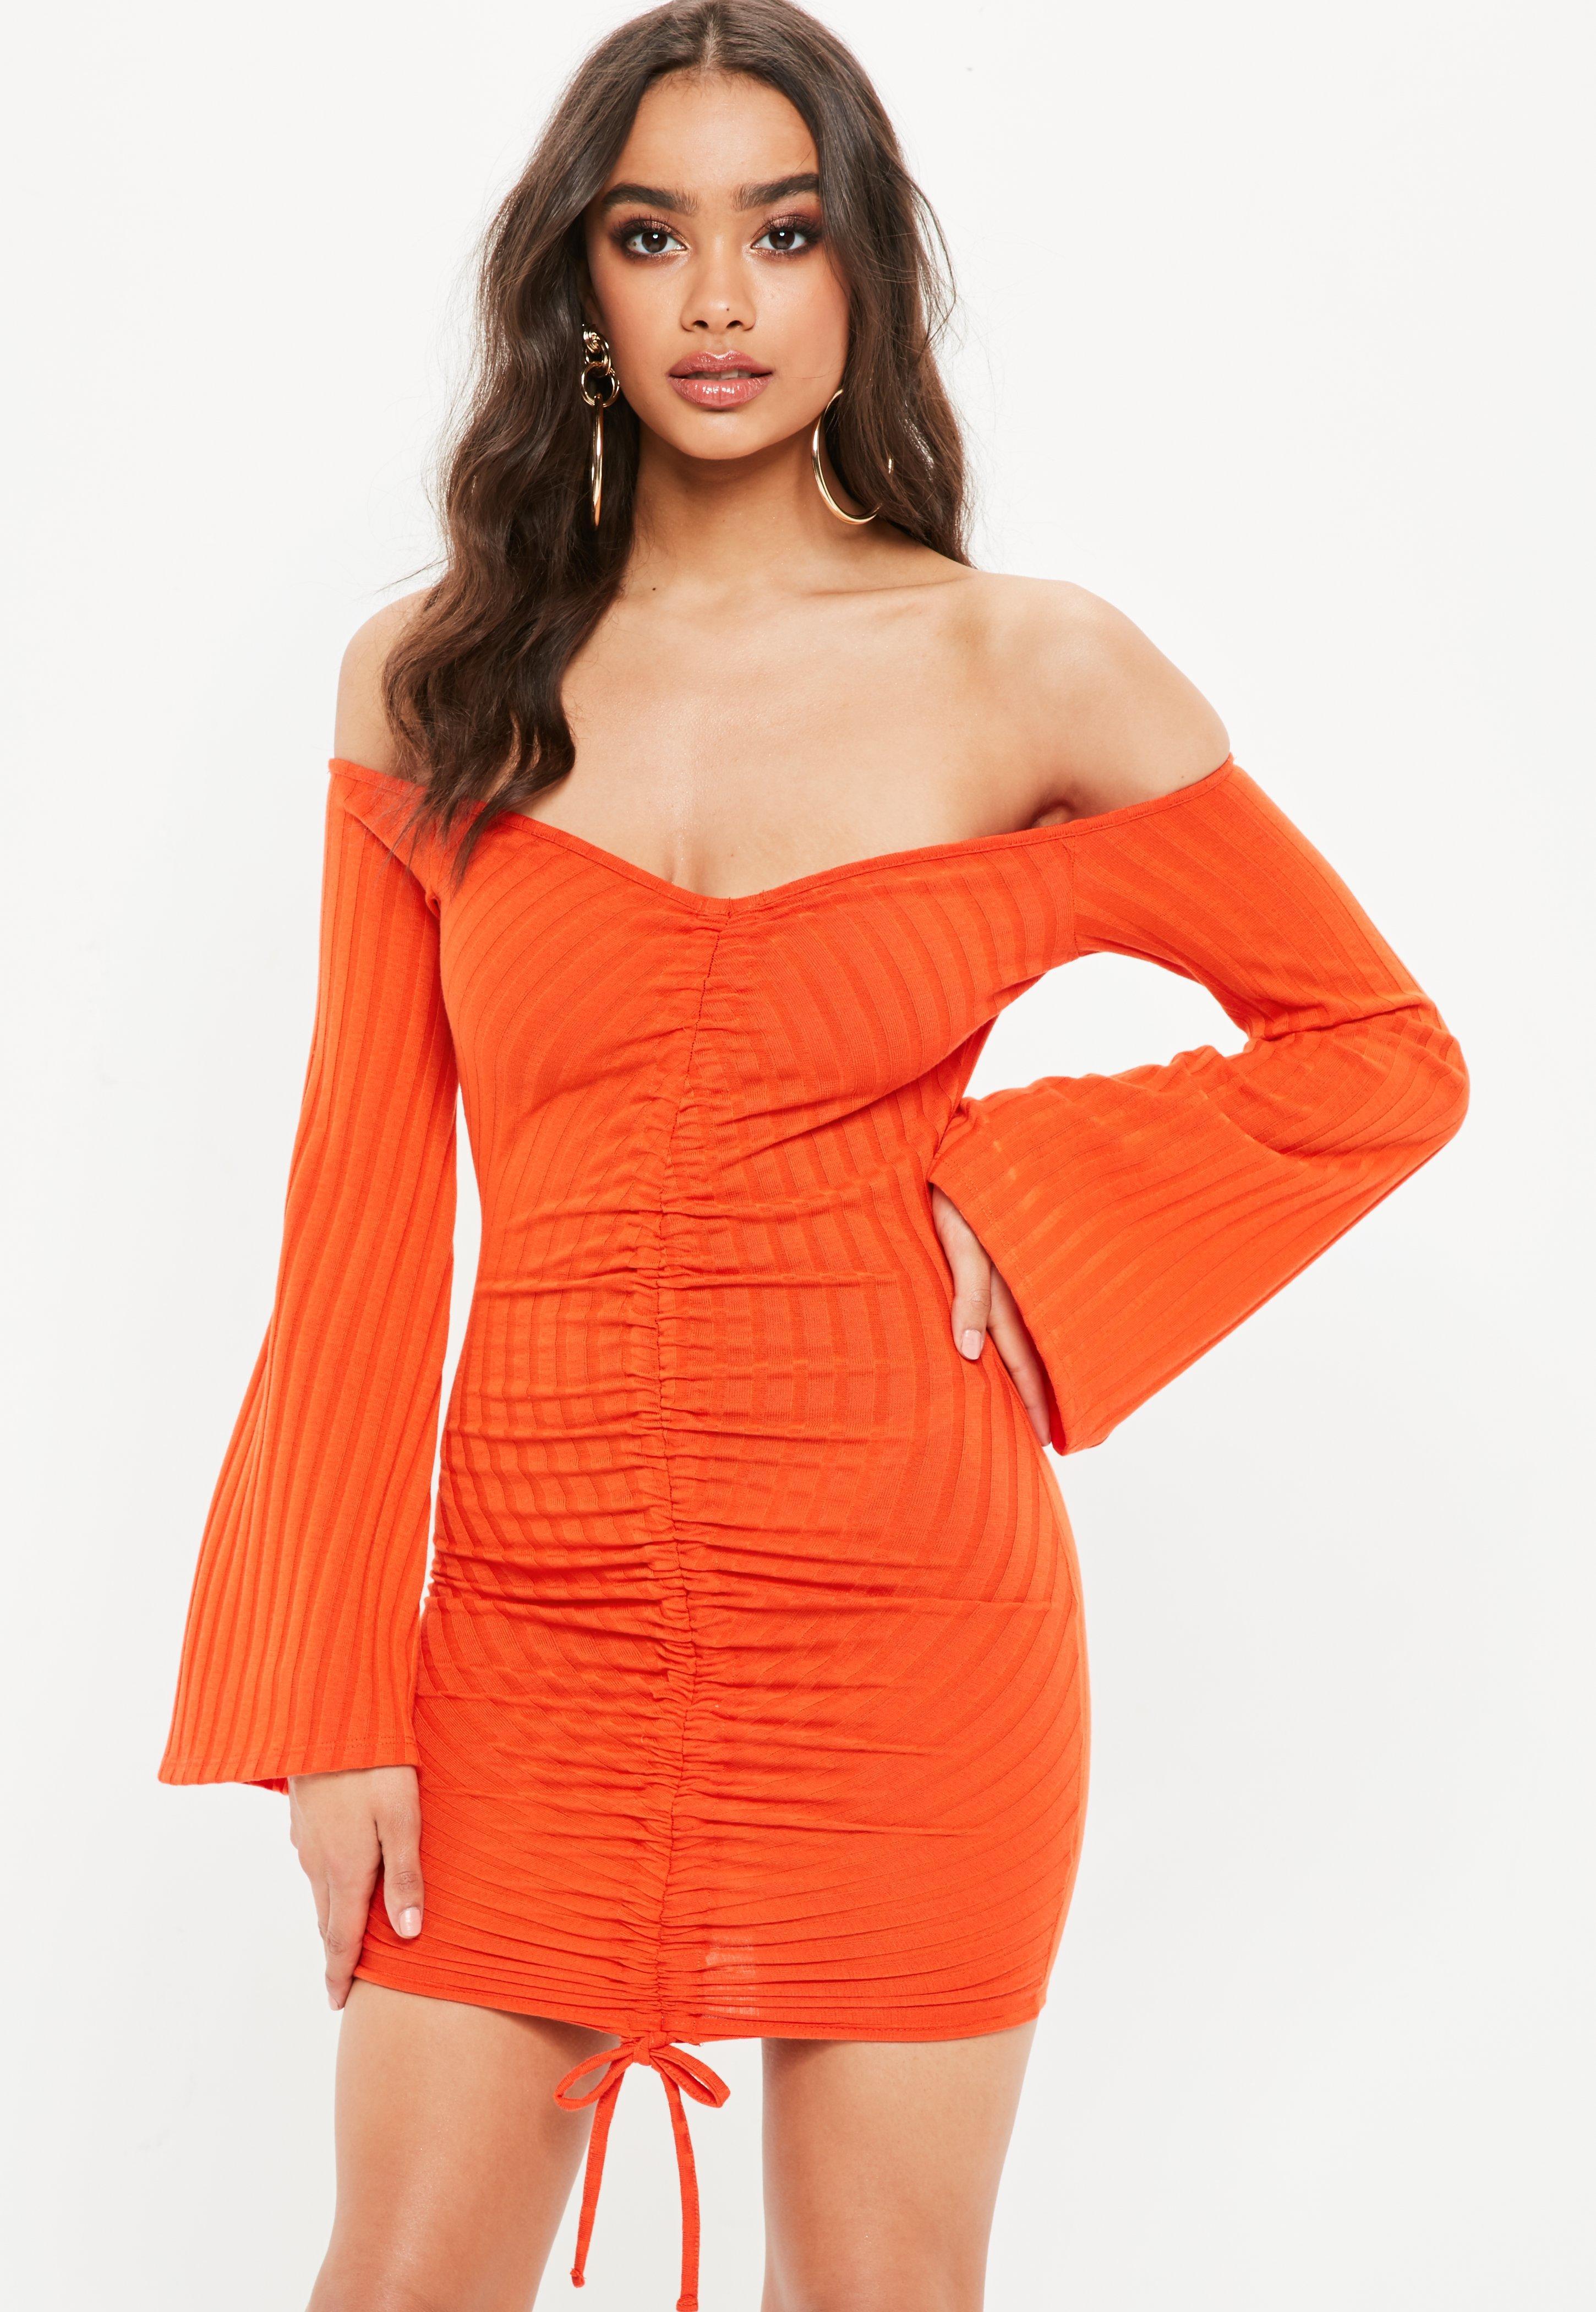 orange above knee dress australia